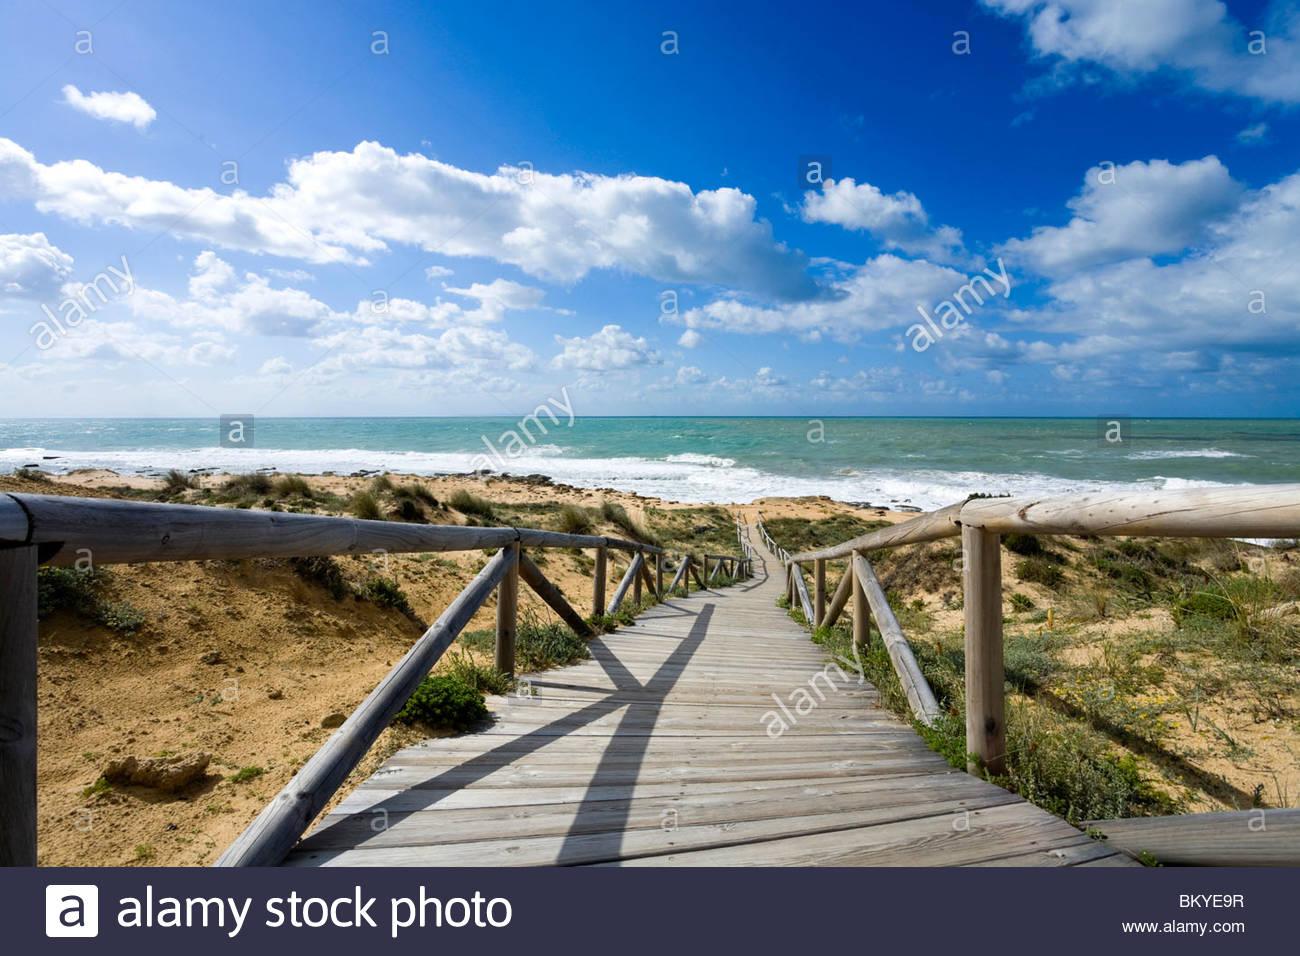 Strand von Cabo de Trafalgar, Provinz Cadiz, Andalusien, Spanien Stockbild